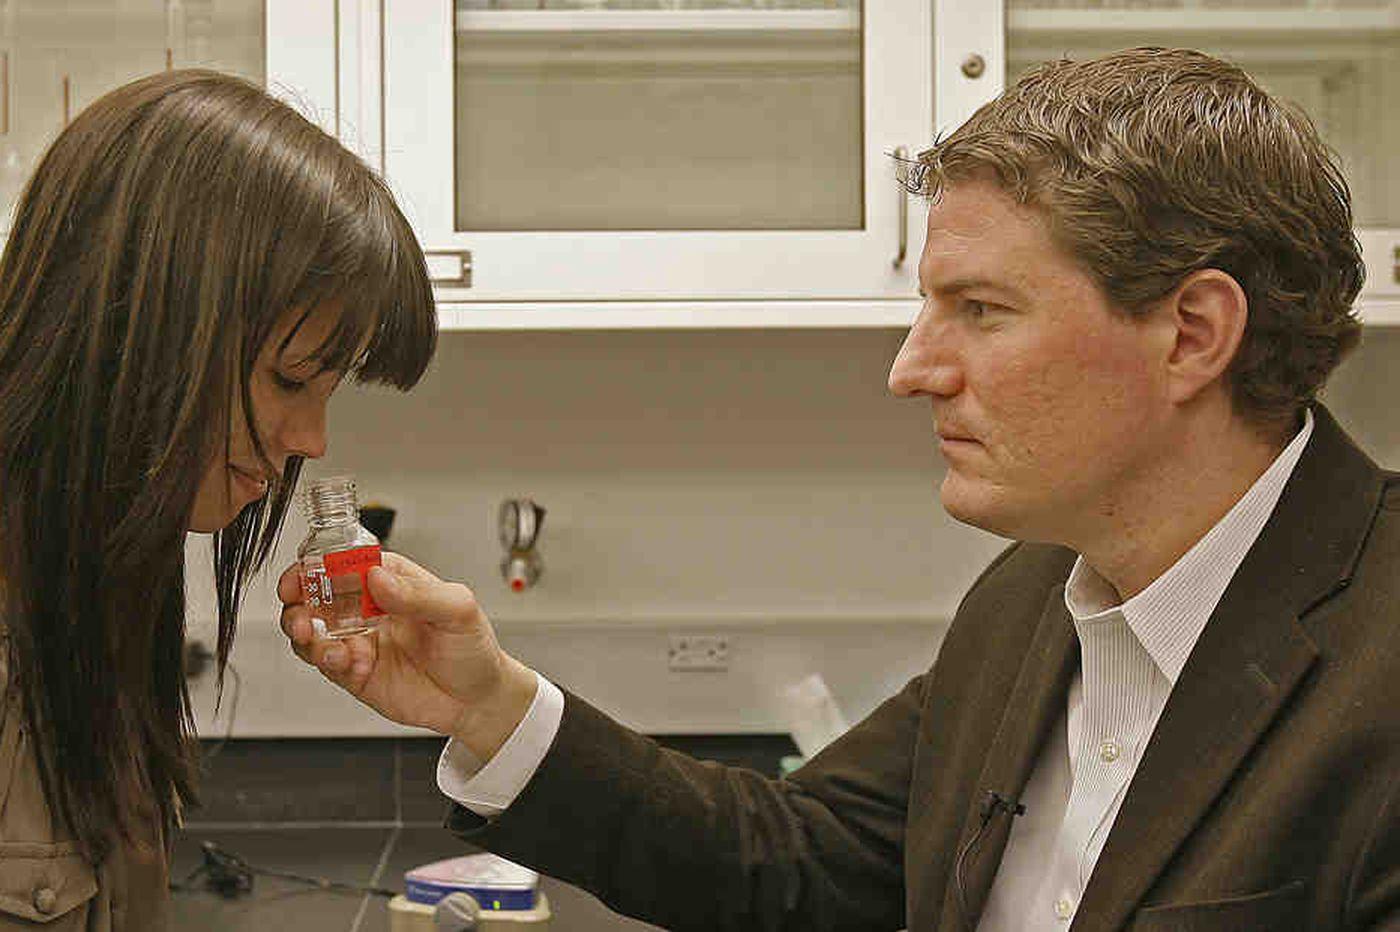 Pierderea mirosului, peel and sniff cards, Sursa The Philadelphia Inquirer